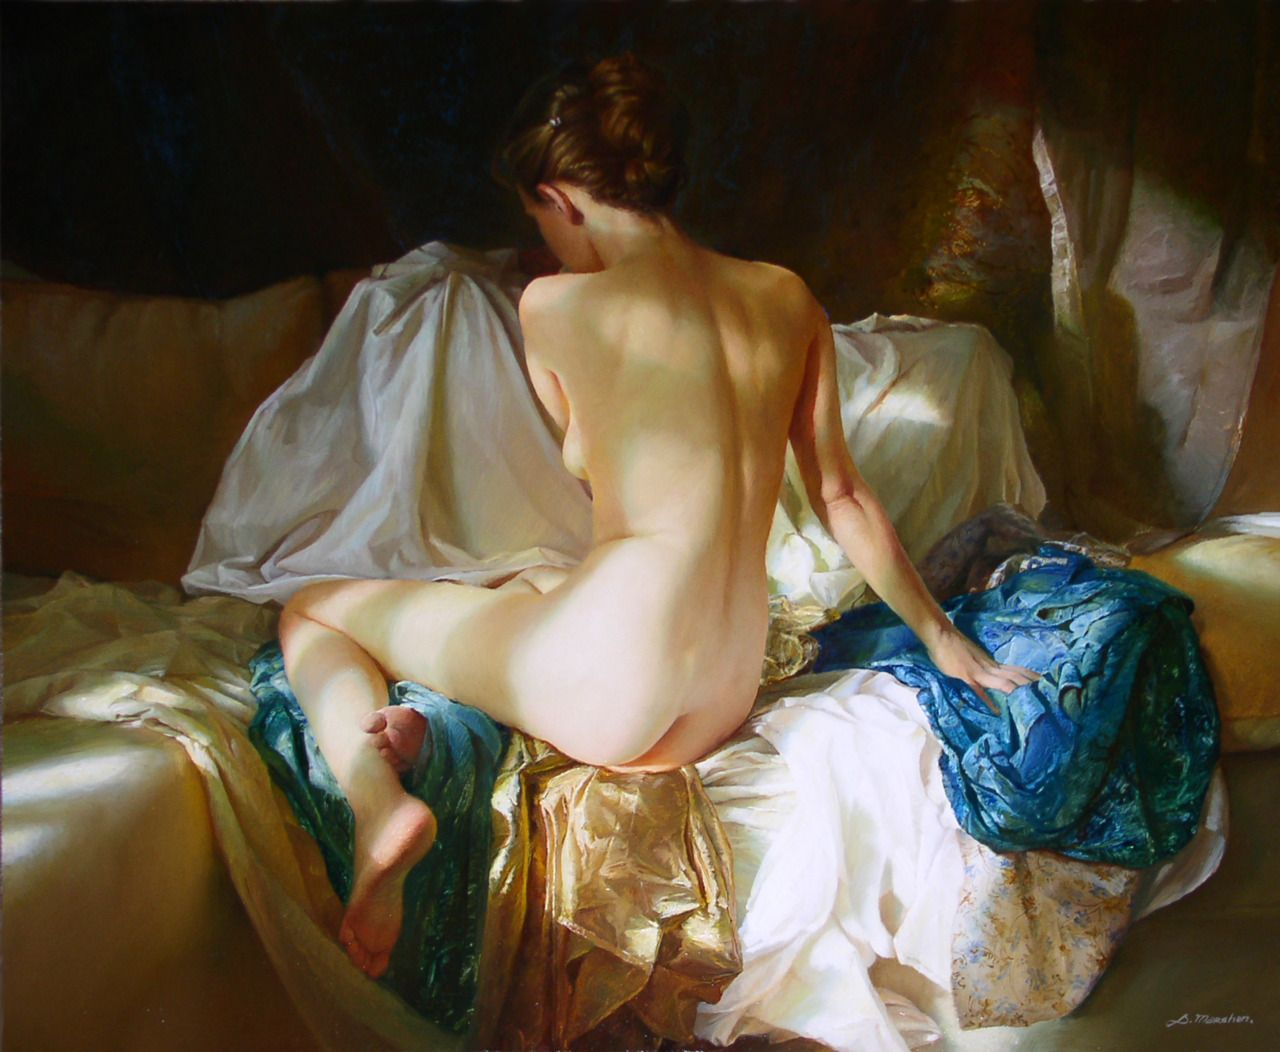 Pov gallery erotic art woman